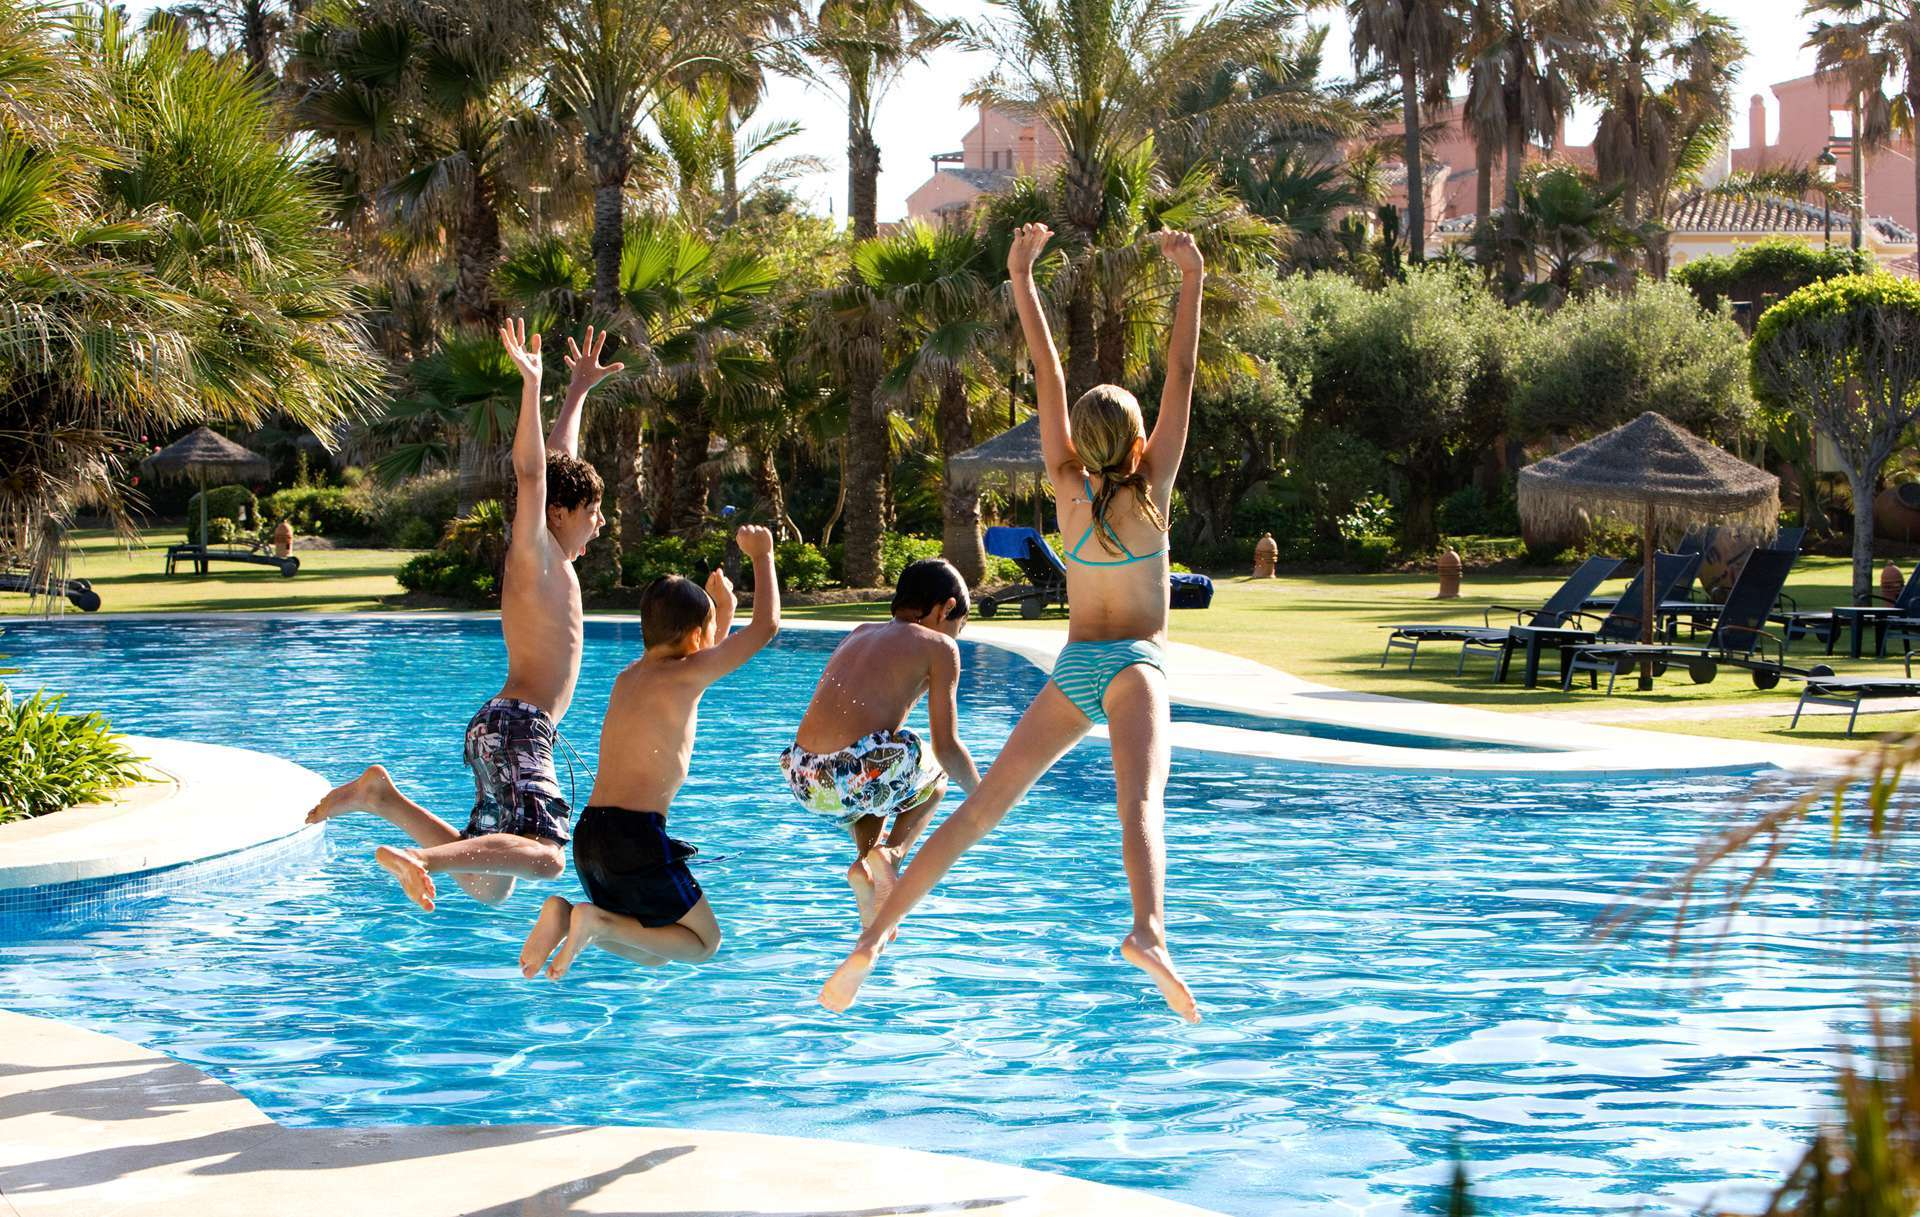 Alarma para piscinas momentos piscina blog for Articulos para piscinas